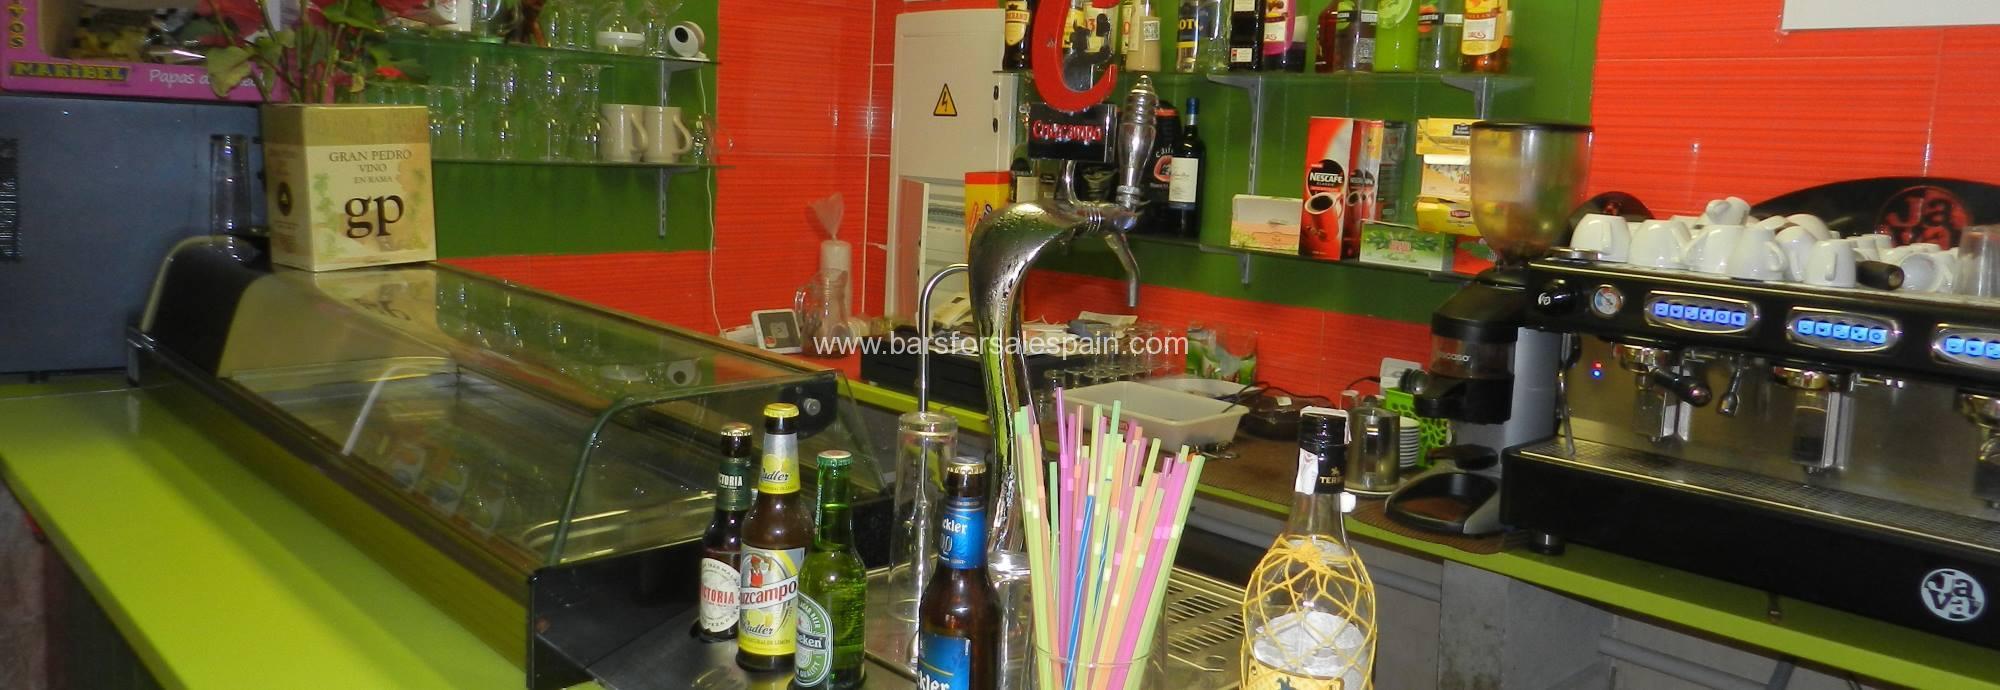 Bar Cafe Restaurant For Sale in Fuengirola, Malaga, Spain